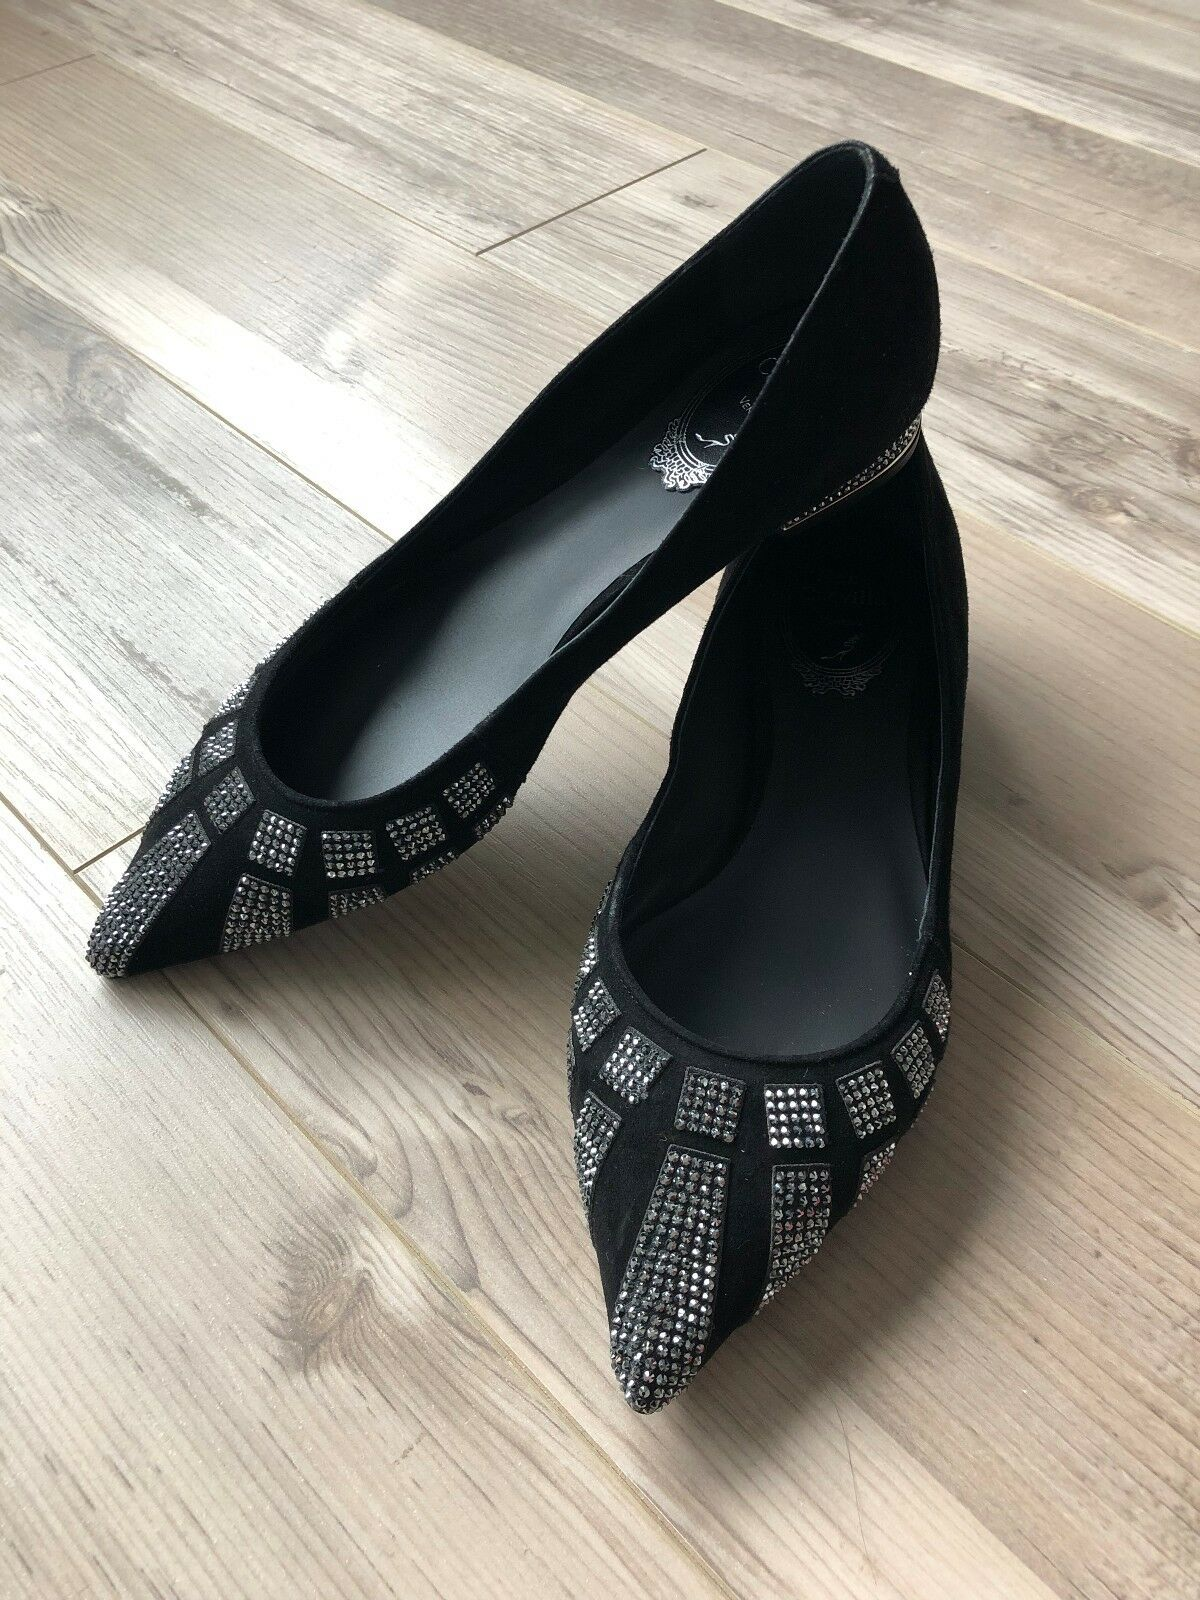 Rene caovilla, ballerina, black suede jet hematite strass, size 36, brand new